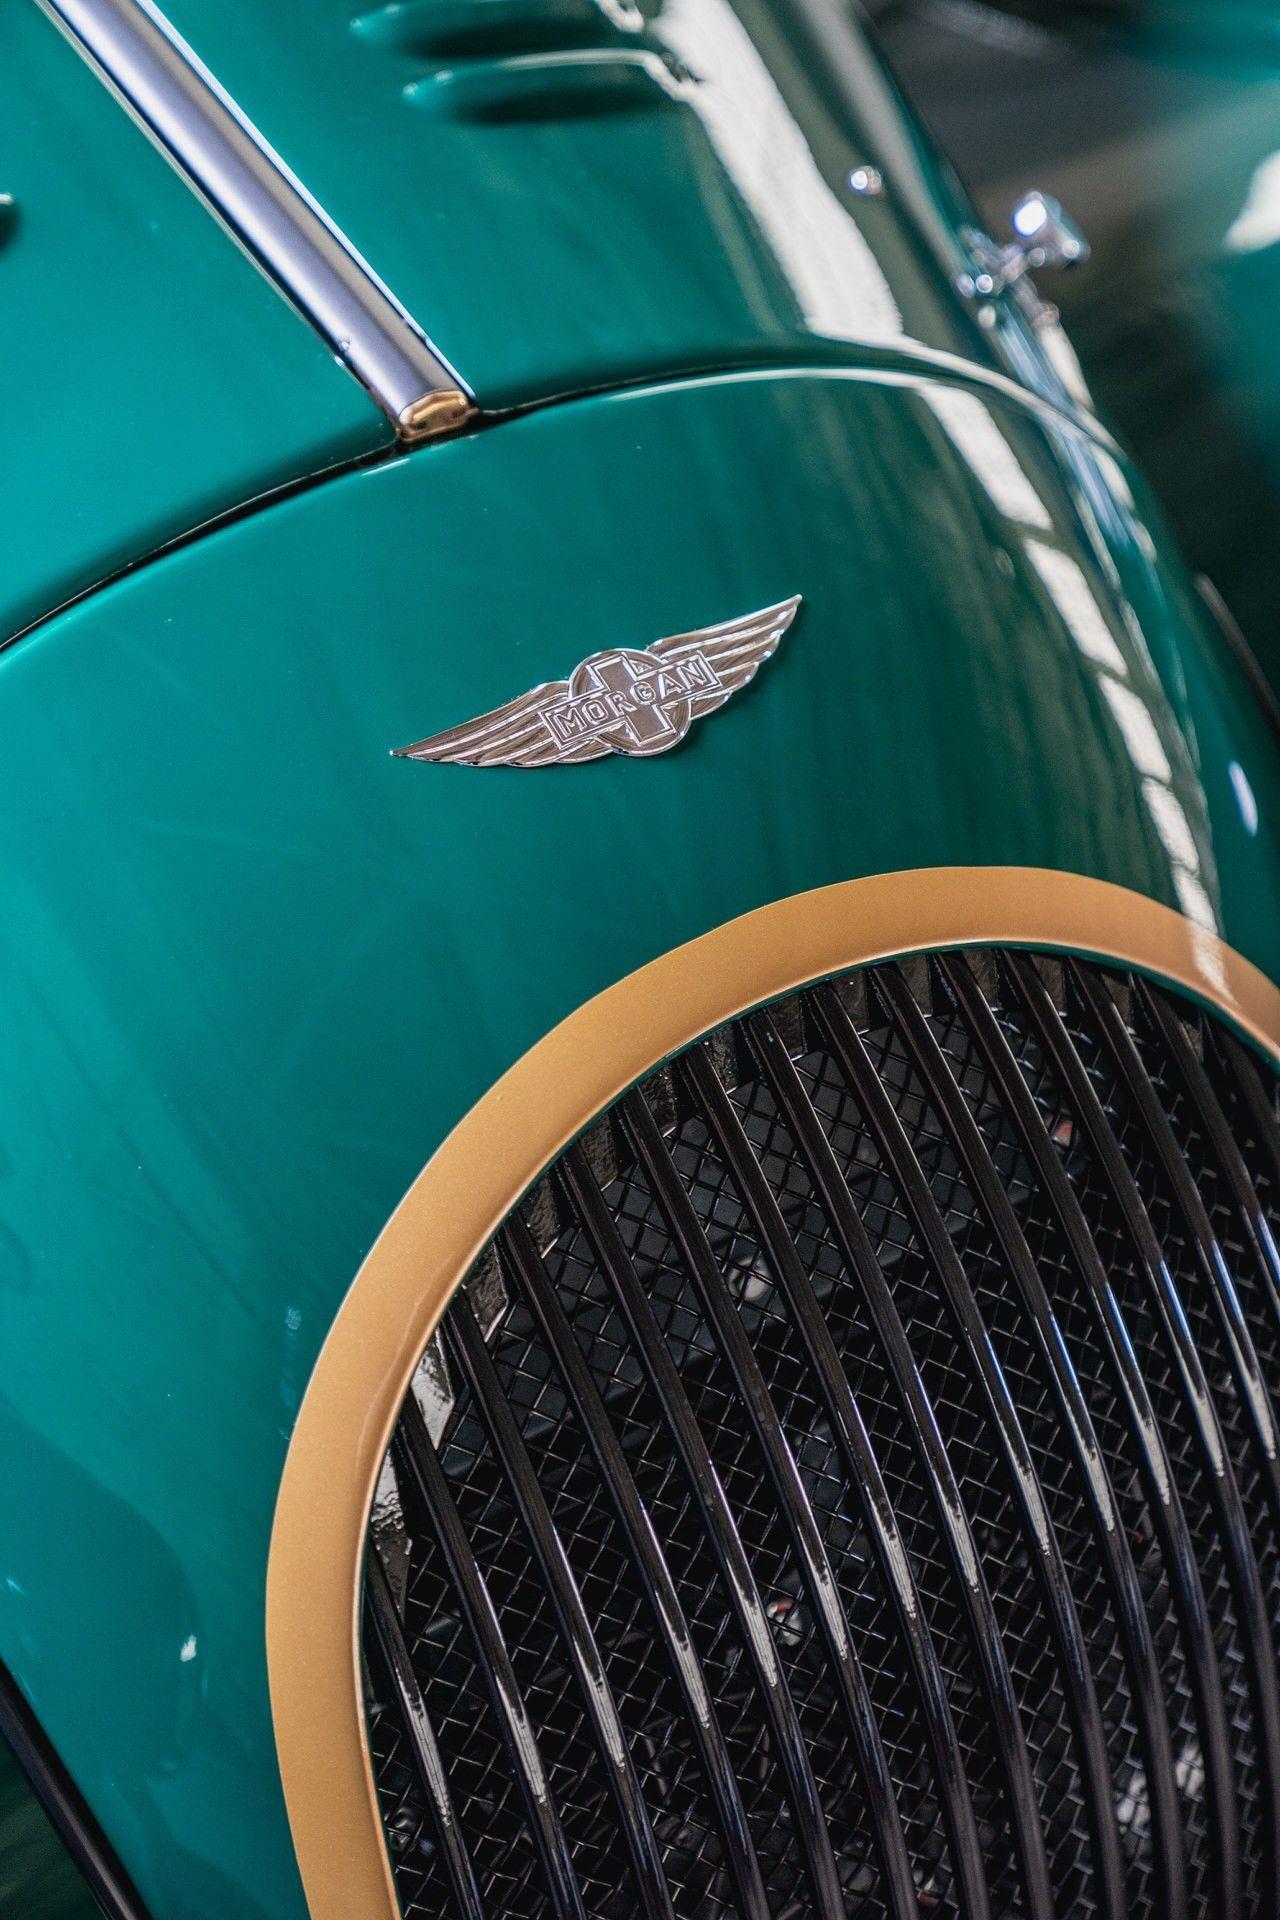 Morgan_Plus_Four_race_cars-0000